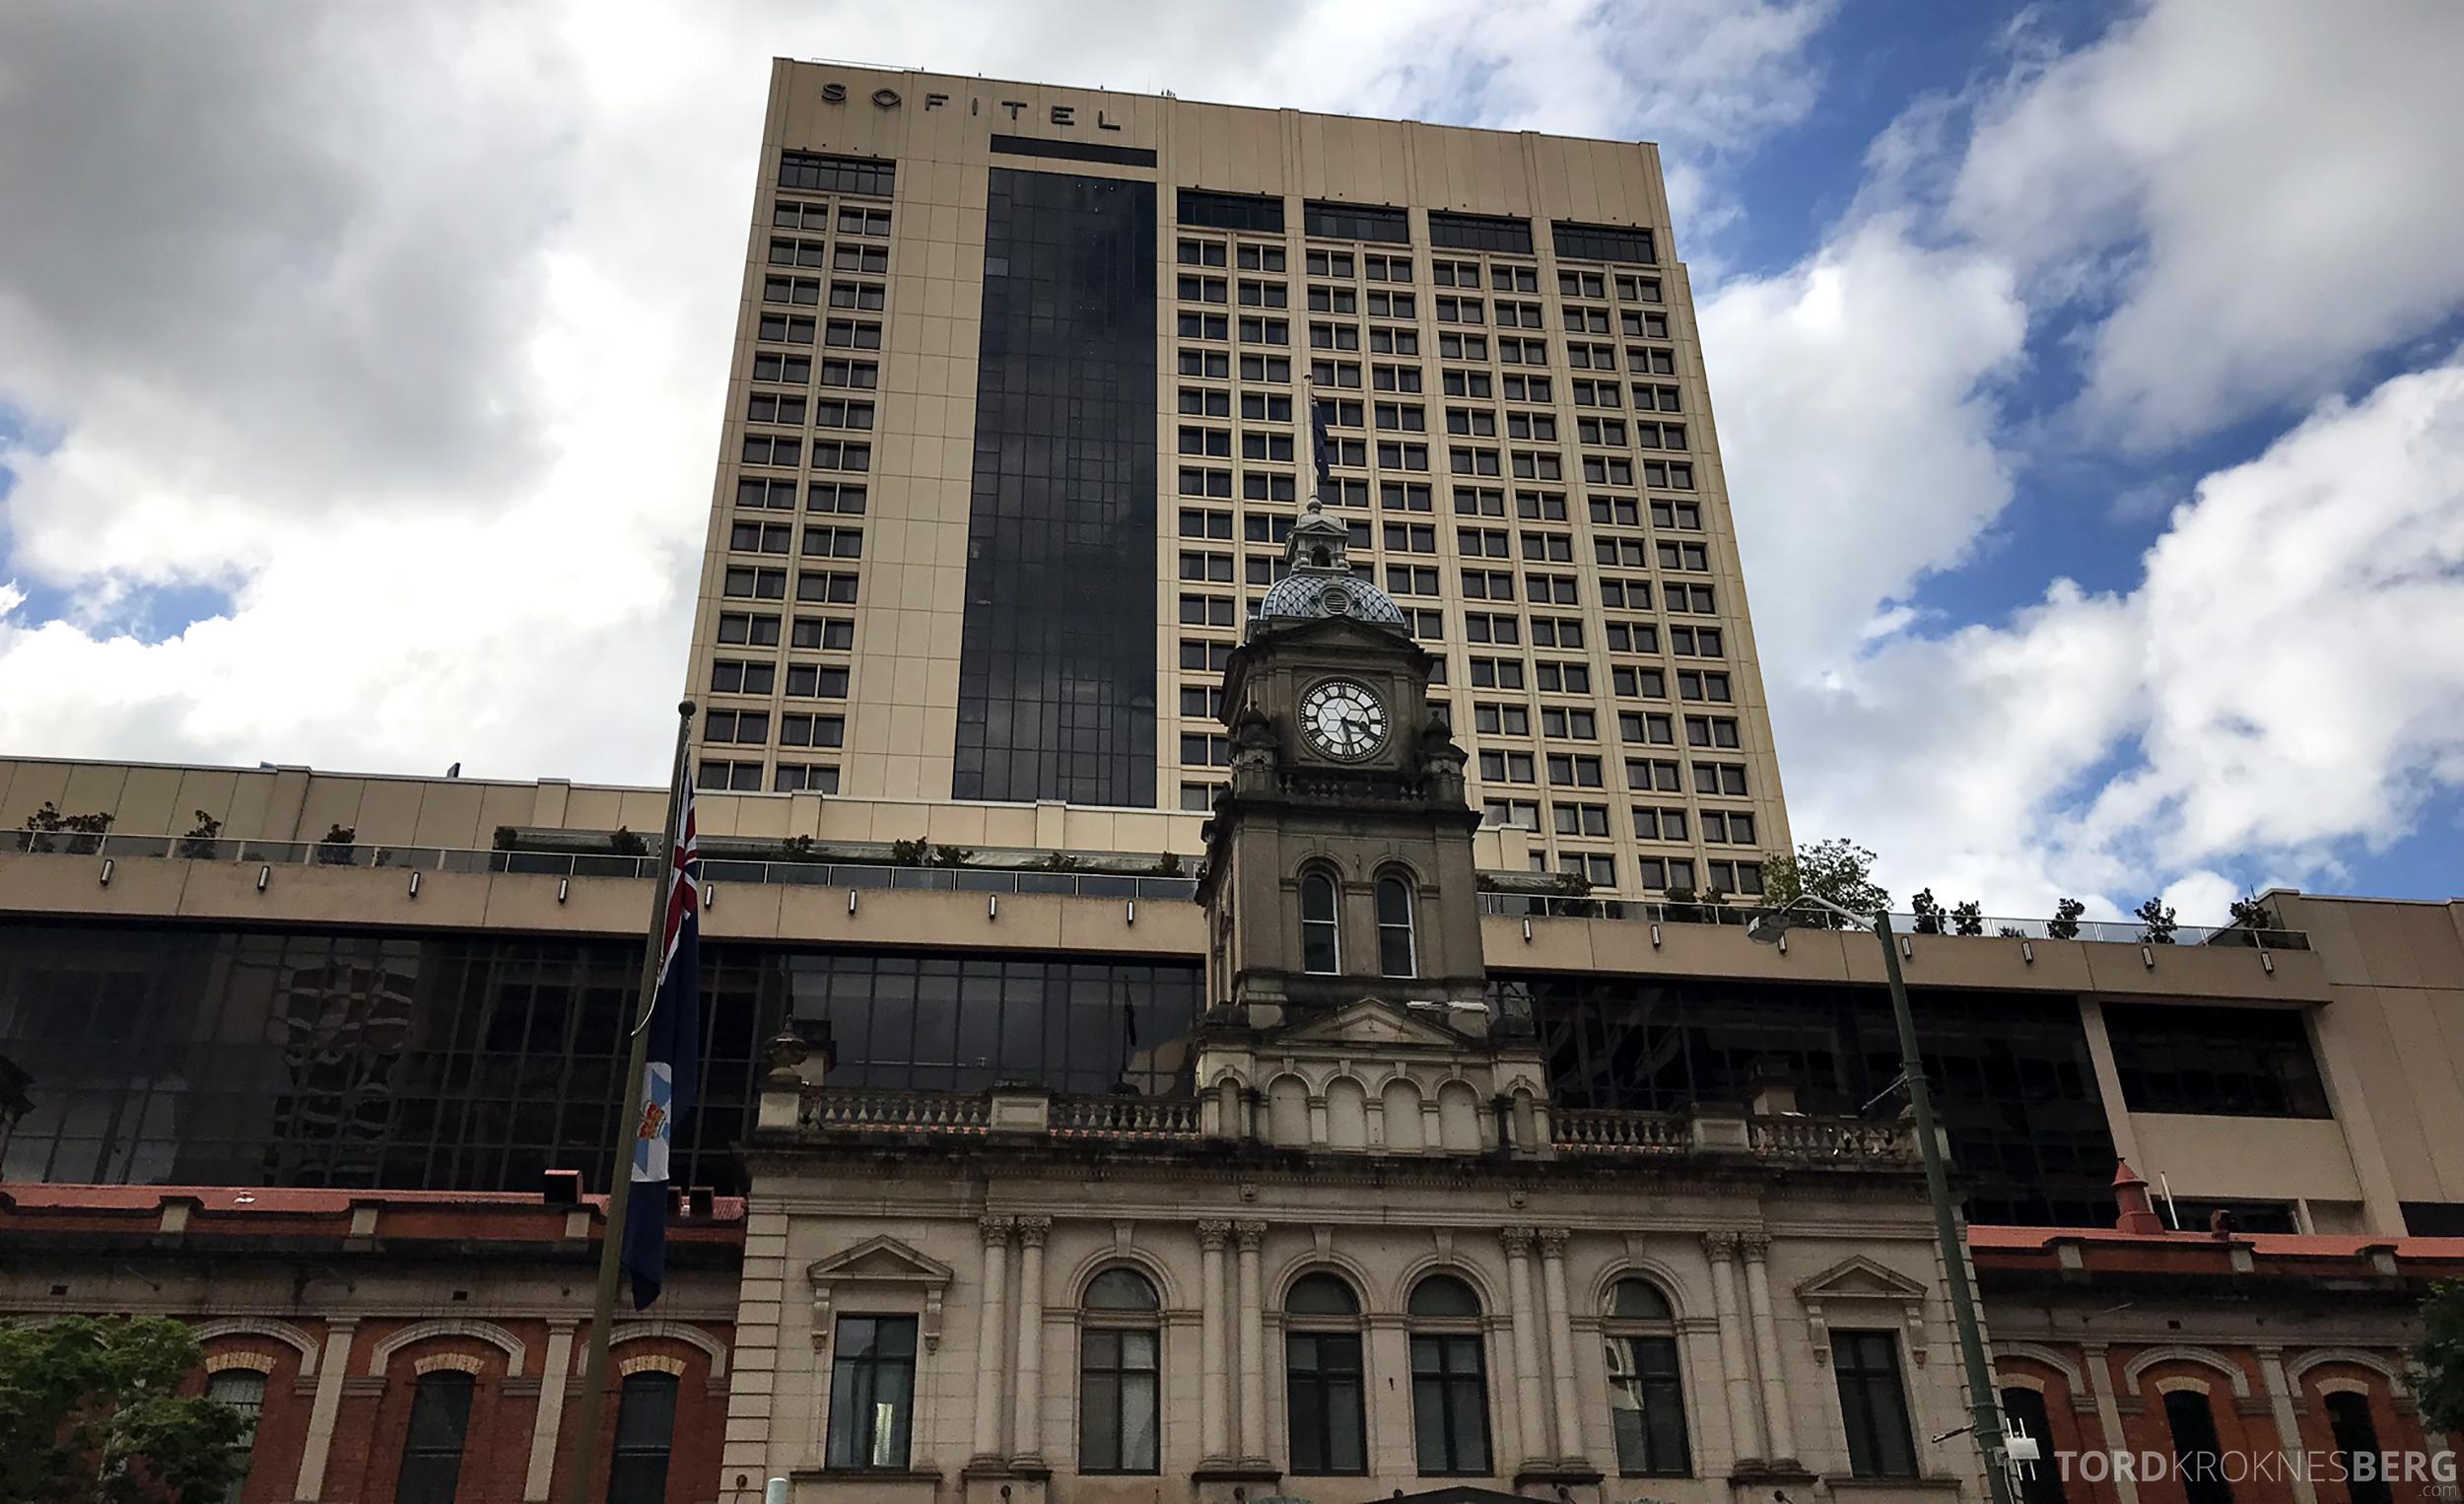 Sofitel Hotel Brisbane fasade